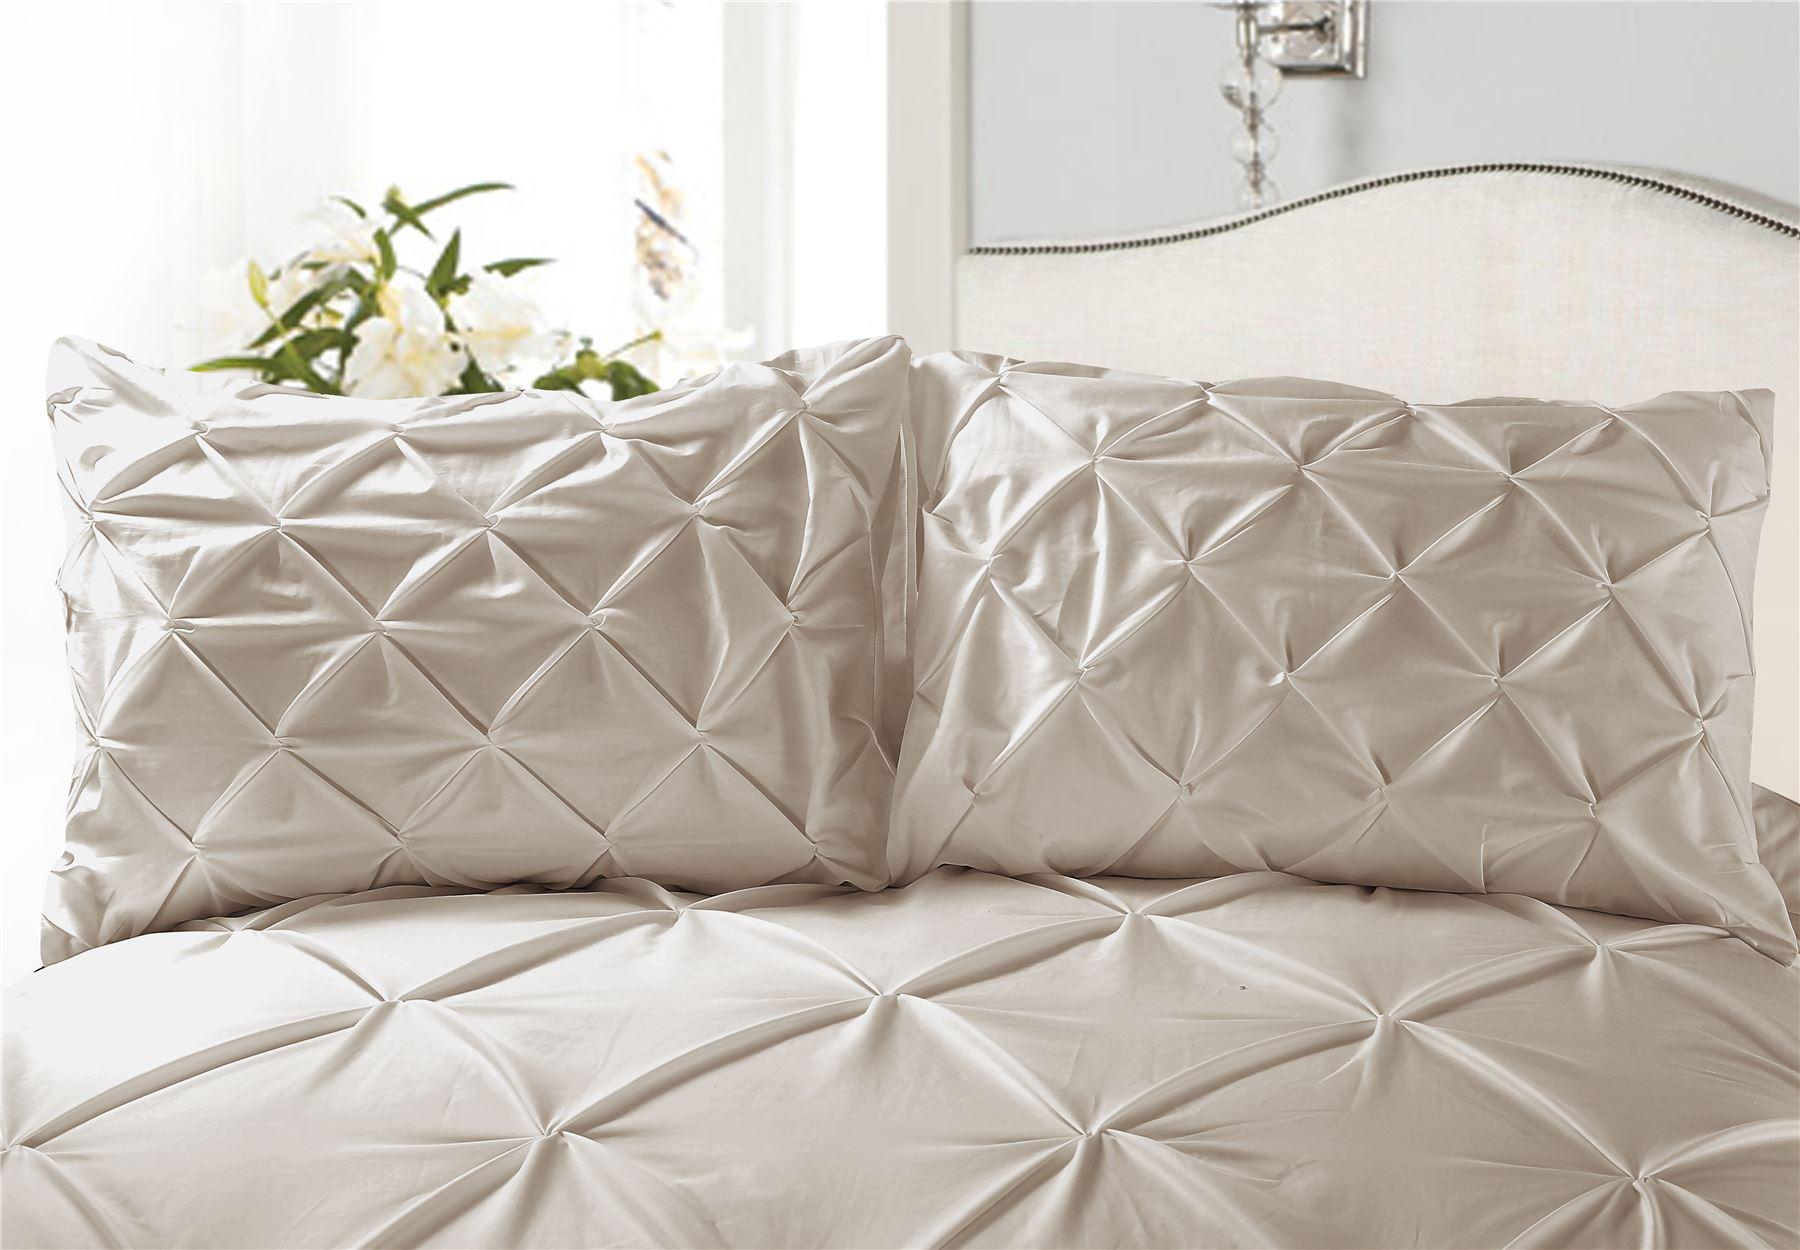 Luxury-Pure-100-Cotton-200-Thread-Pinch-Pleat-Pintuck-Puckering-Duvet-Cover-Set thumbnail 54